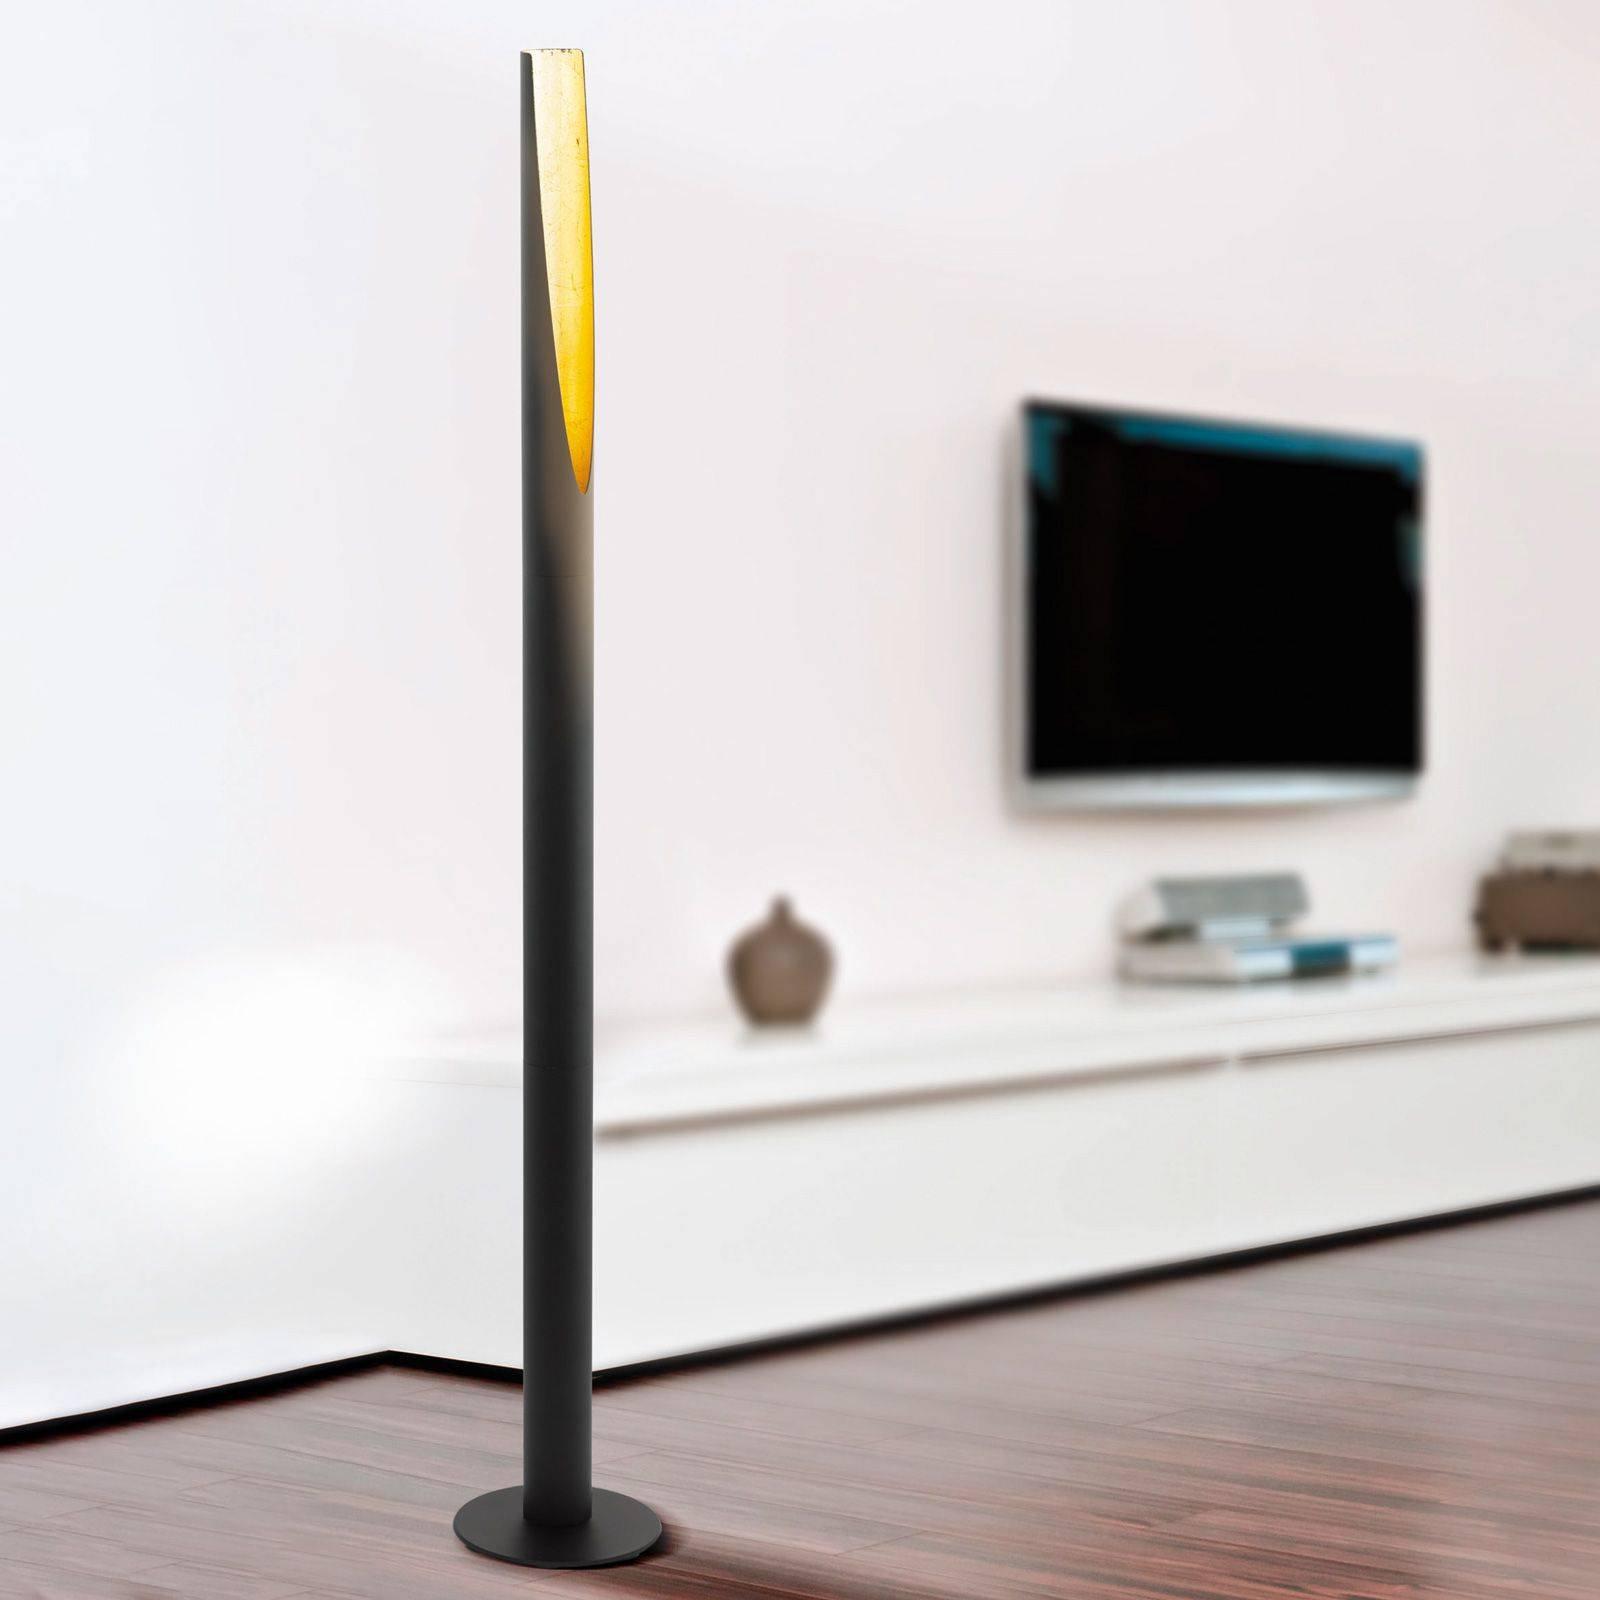 LED-gulvlampe Barbotto i svart, gull.